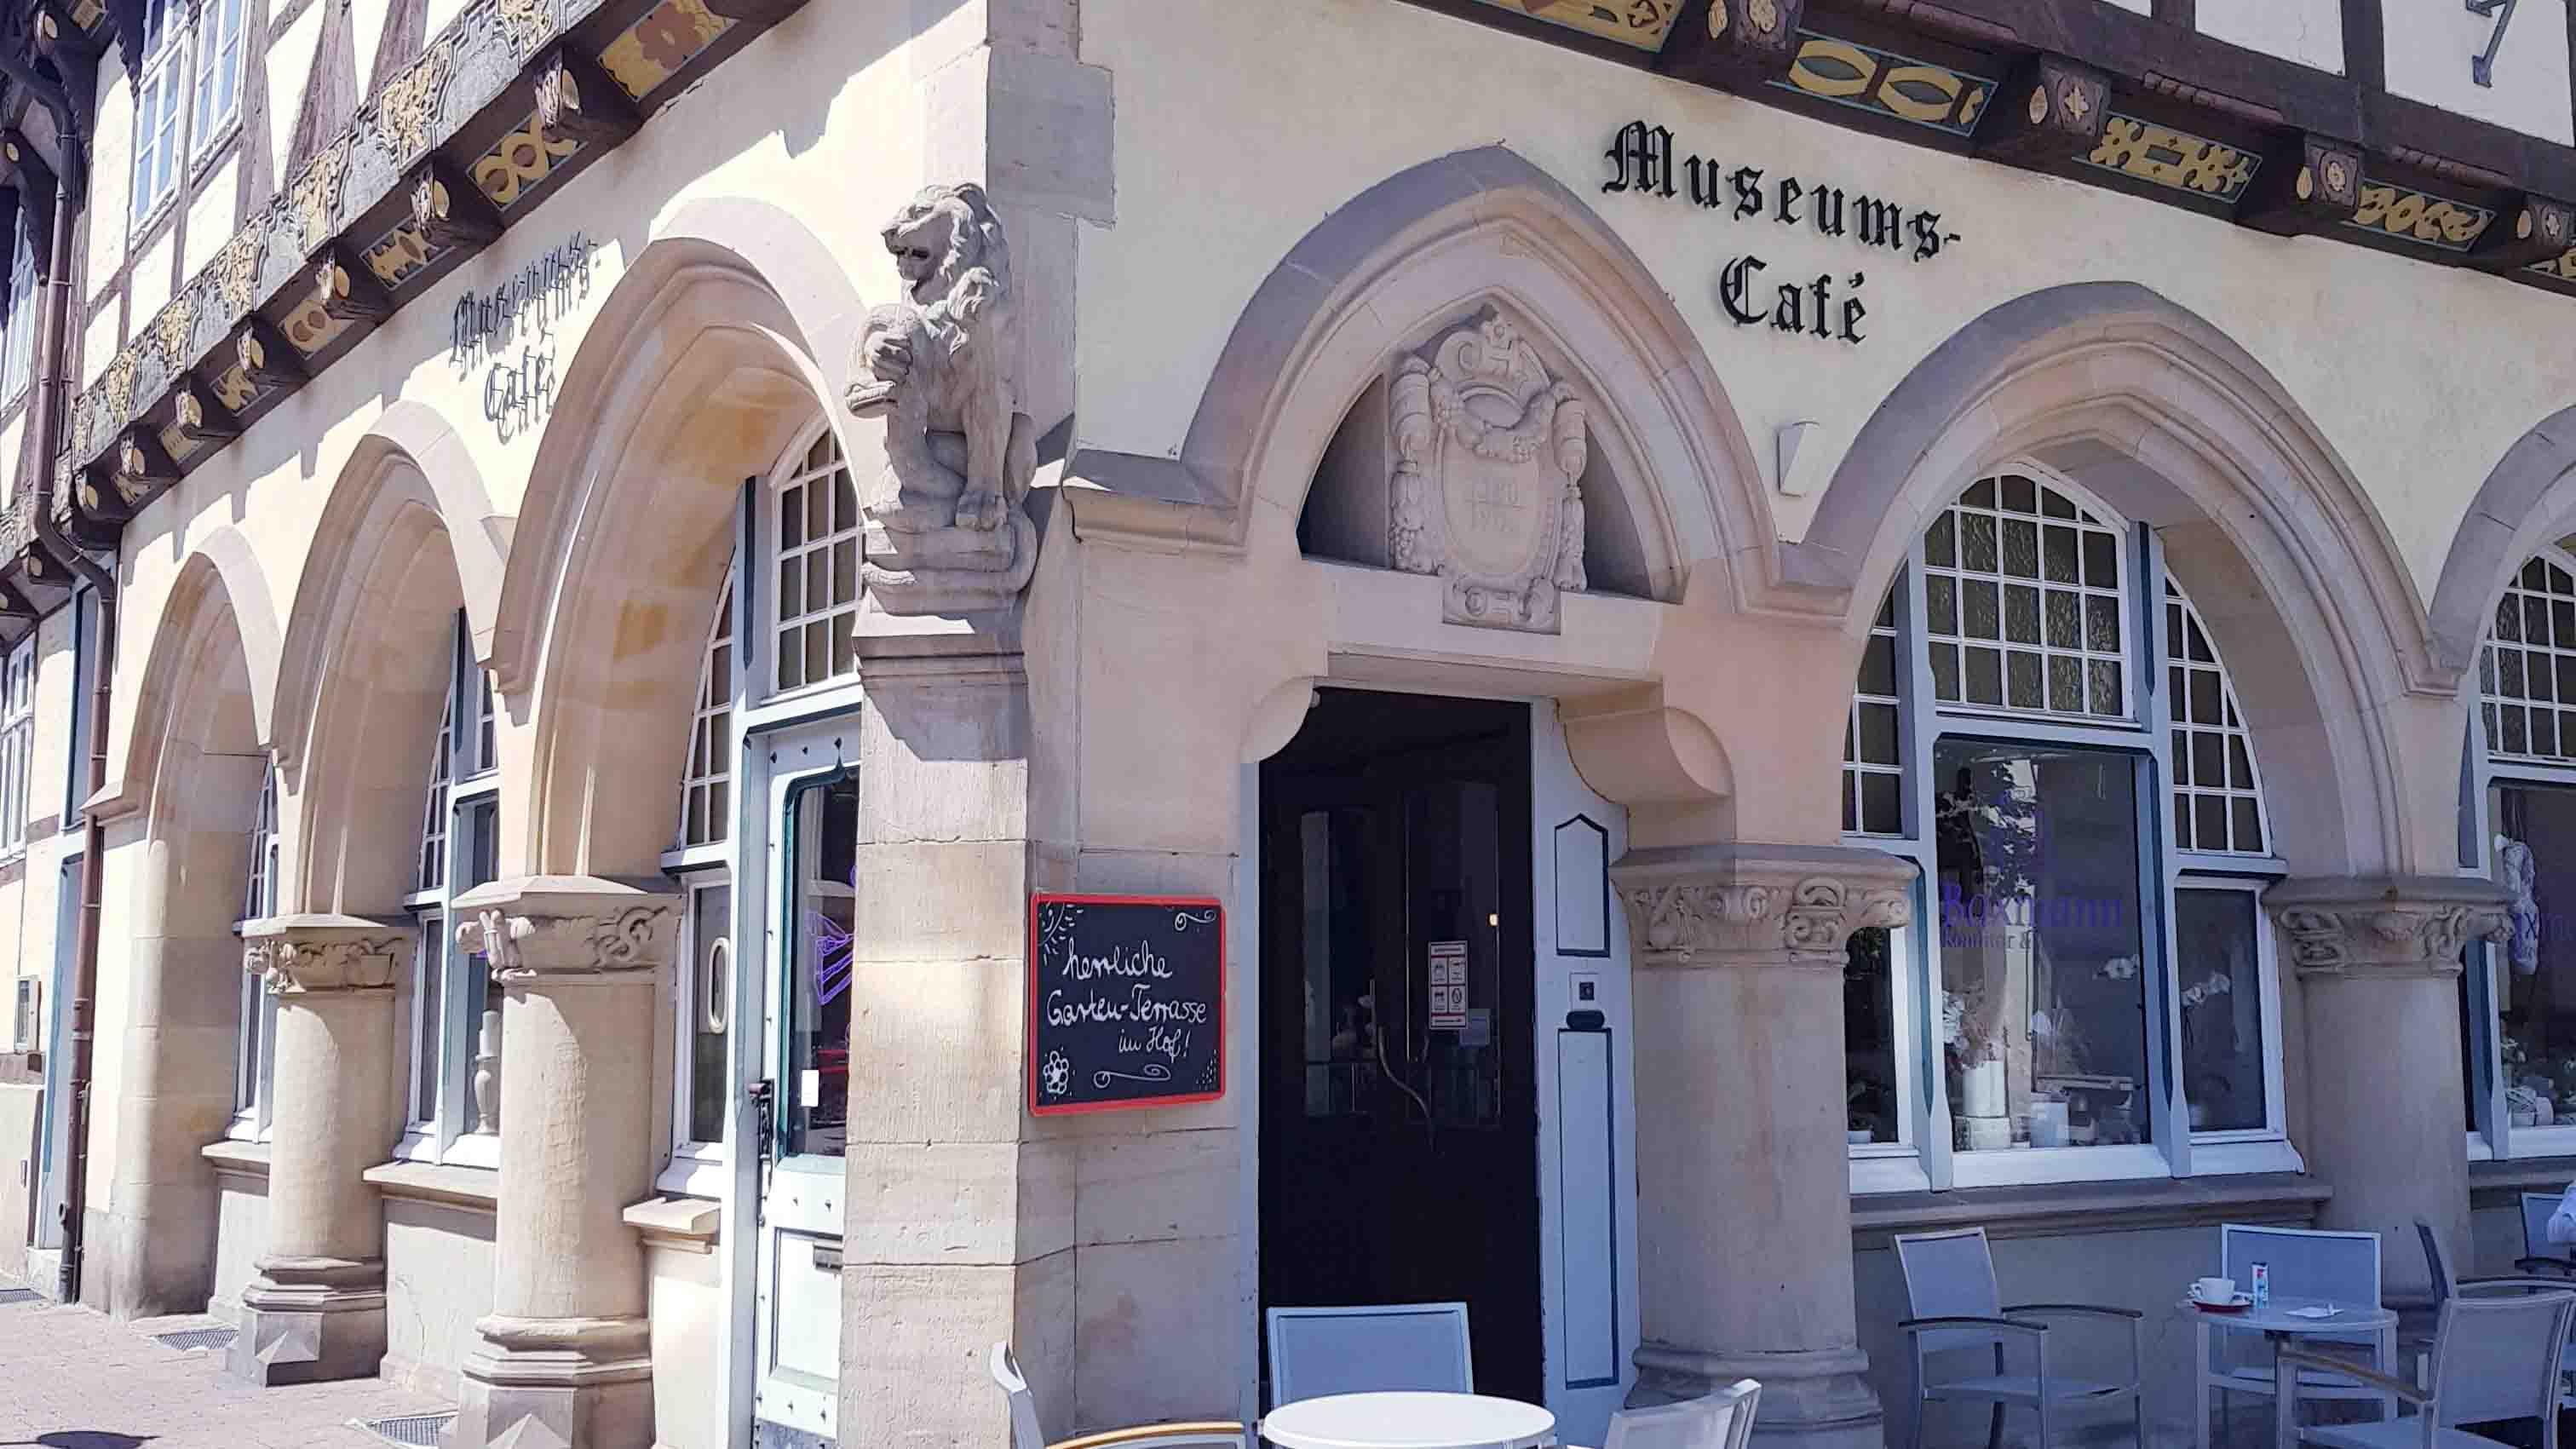 Café Baxmann Celle, Eingang